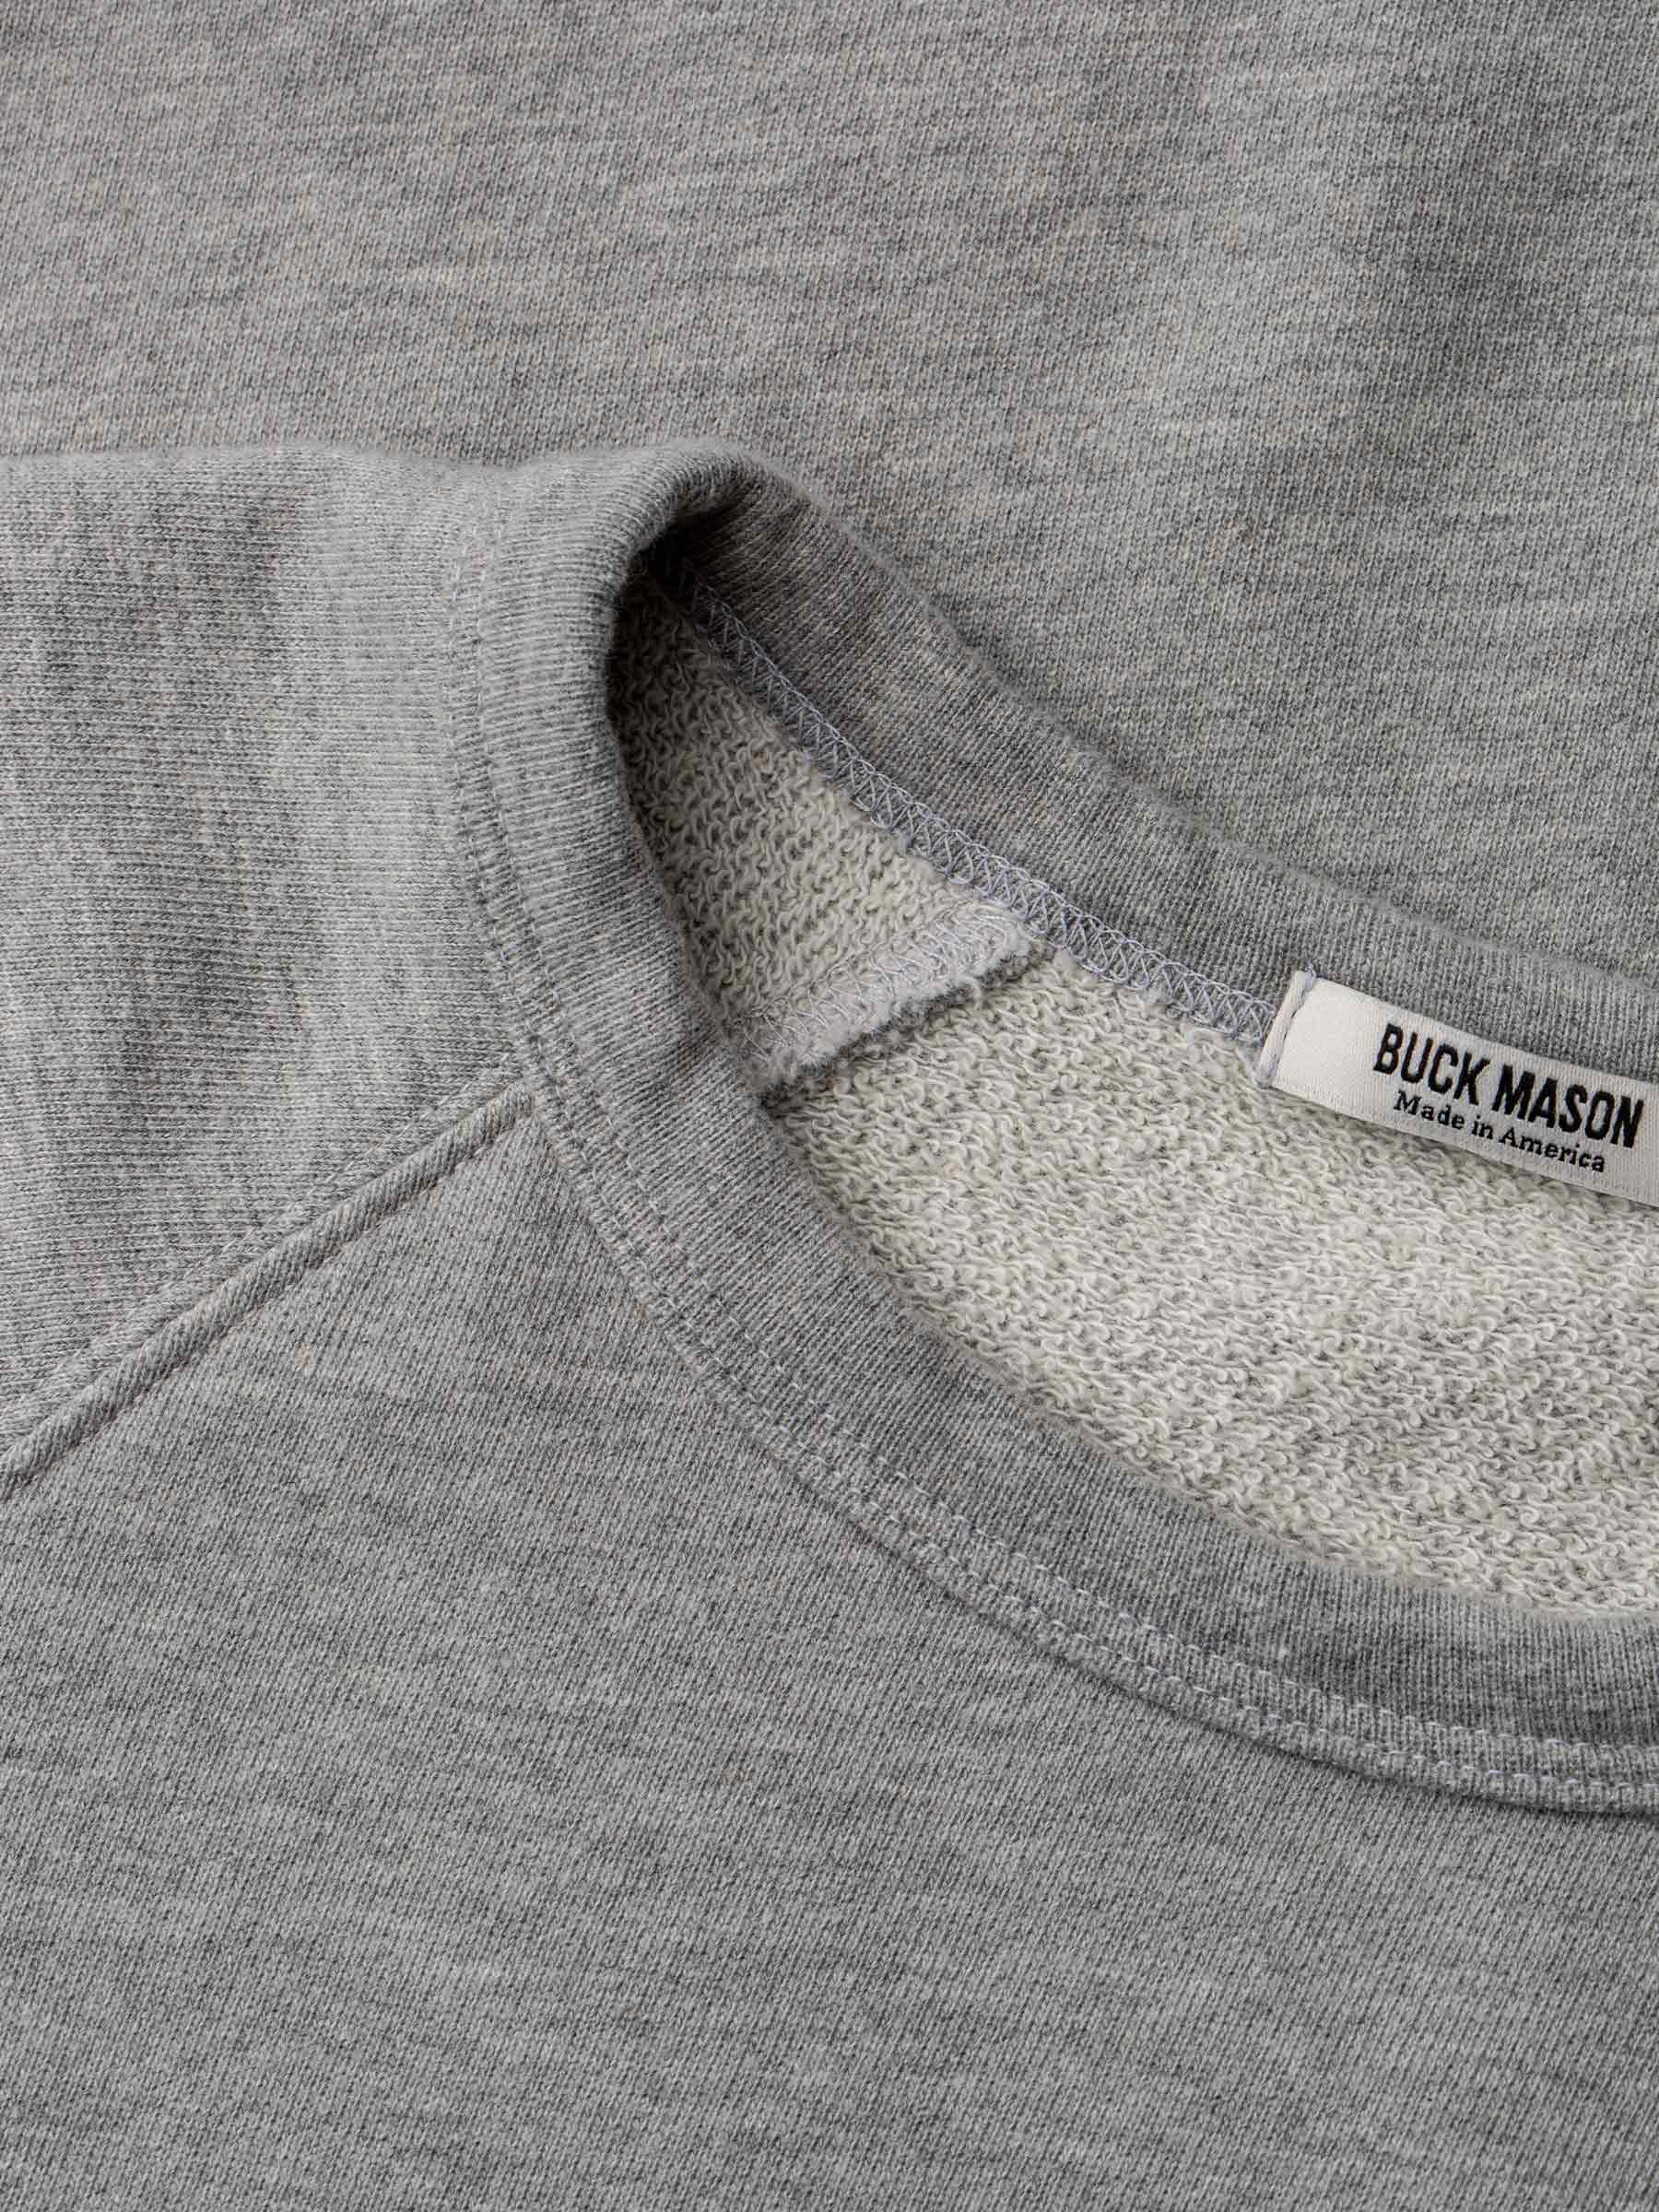 Buck Mason - Grenada Venice Wash Vintage French Terry Raglan Sweatshirt